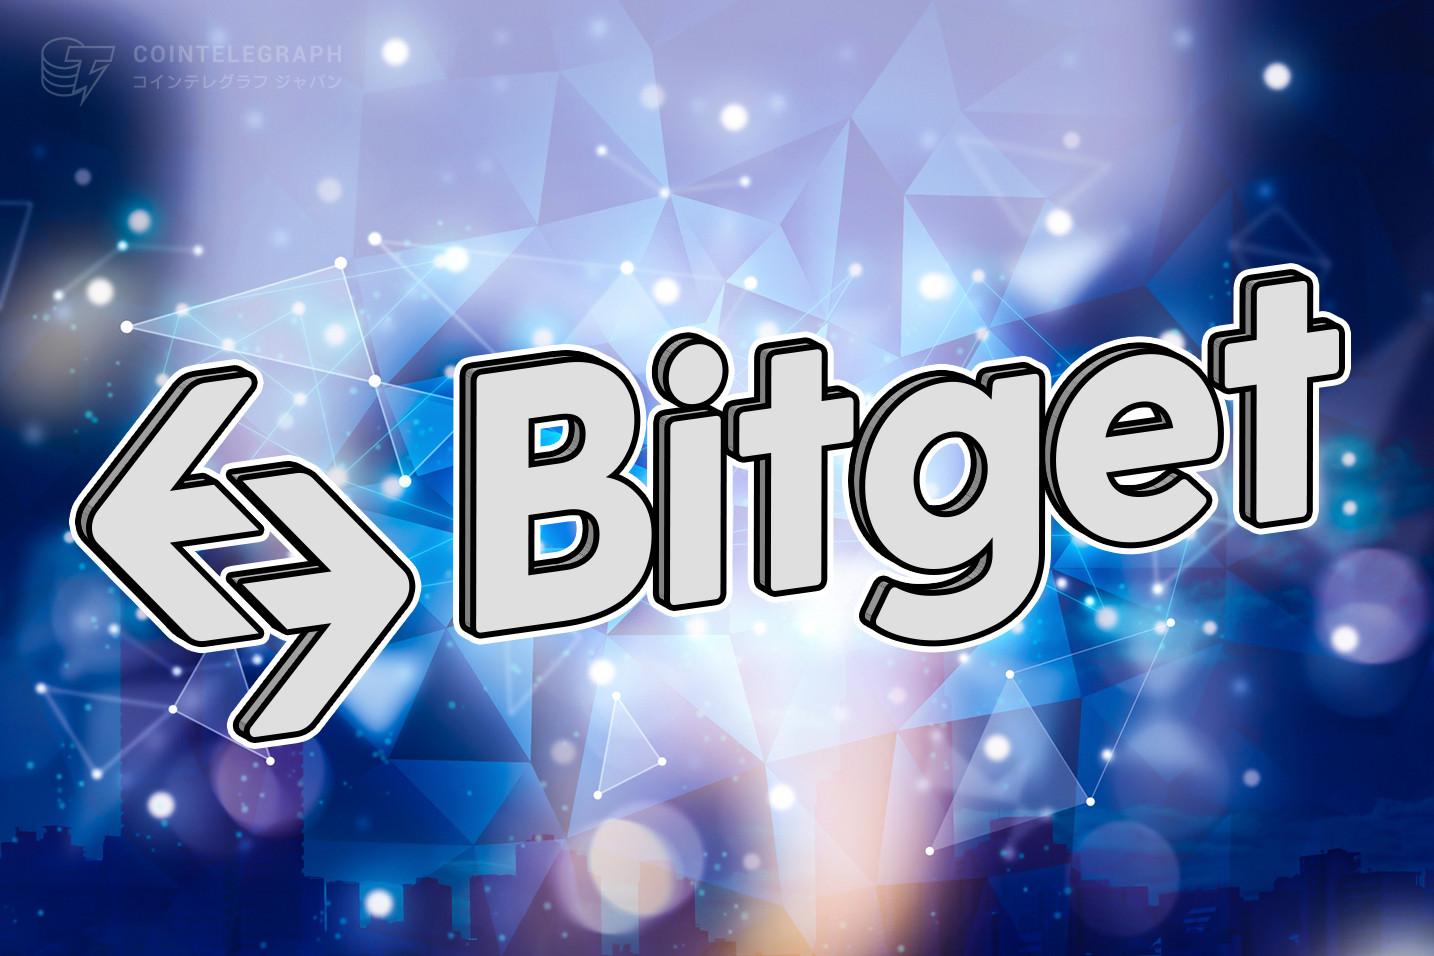 Bitget 「キング・オブ・Bitget」(KCGI)トレーディング大会がついにエントリー開始!賞金総額最大100BTC!